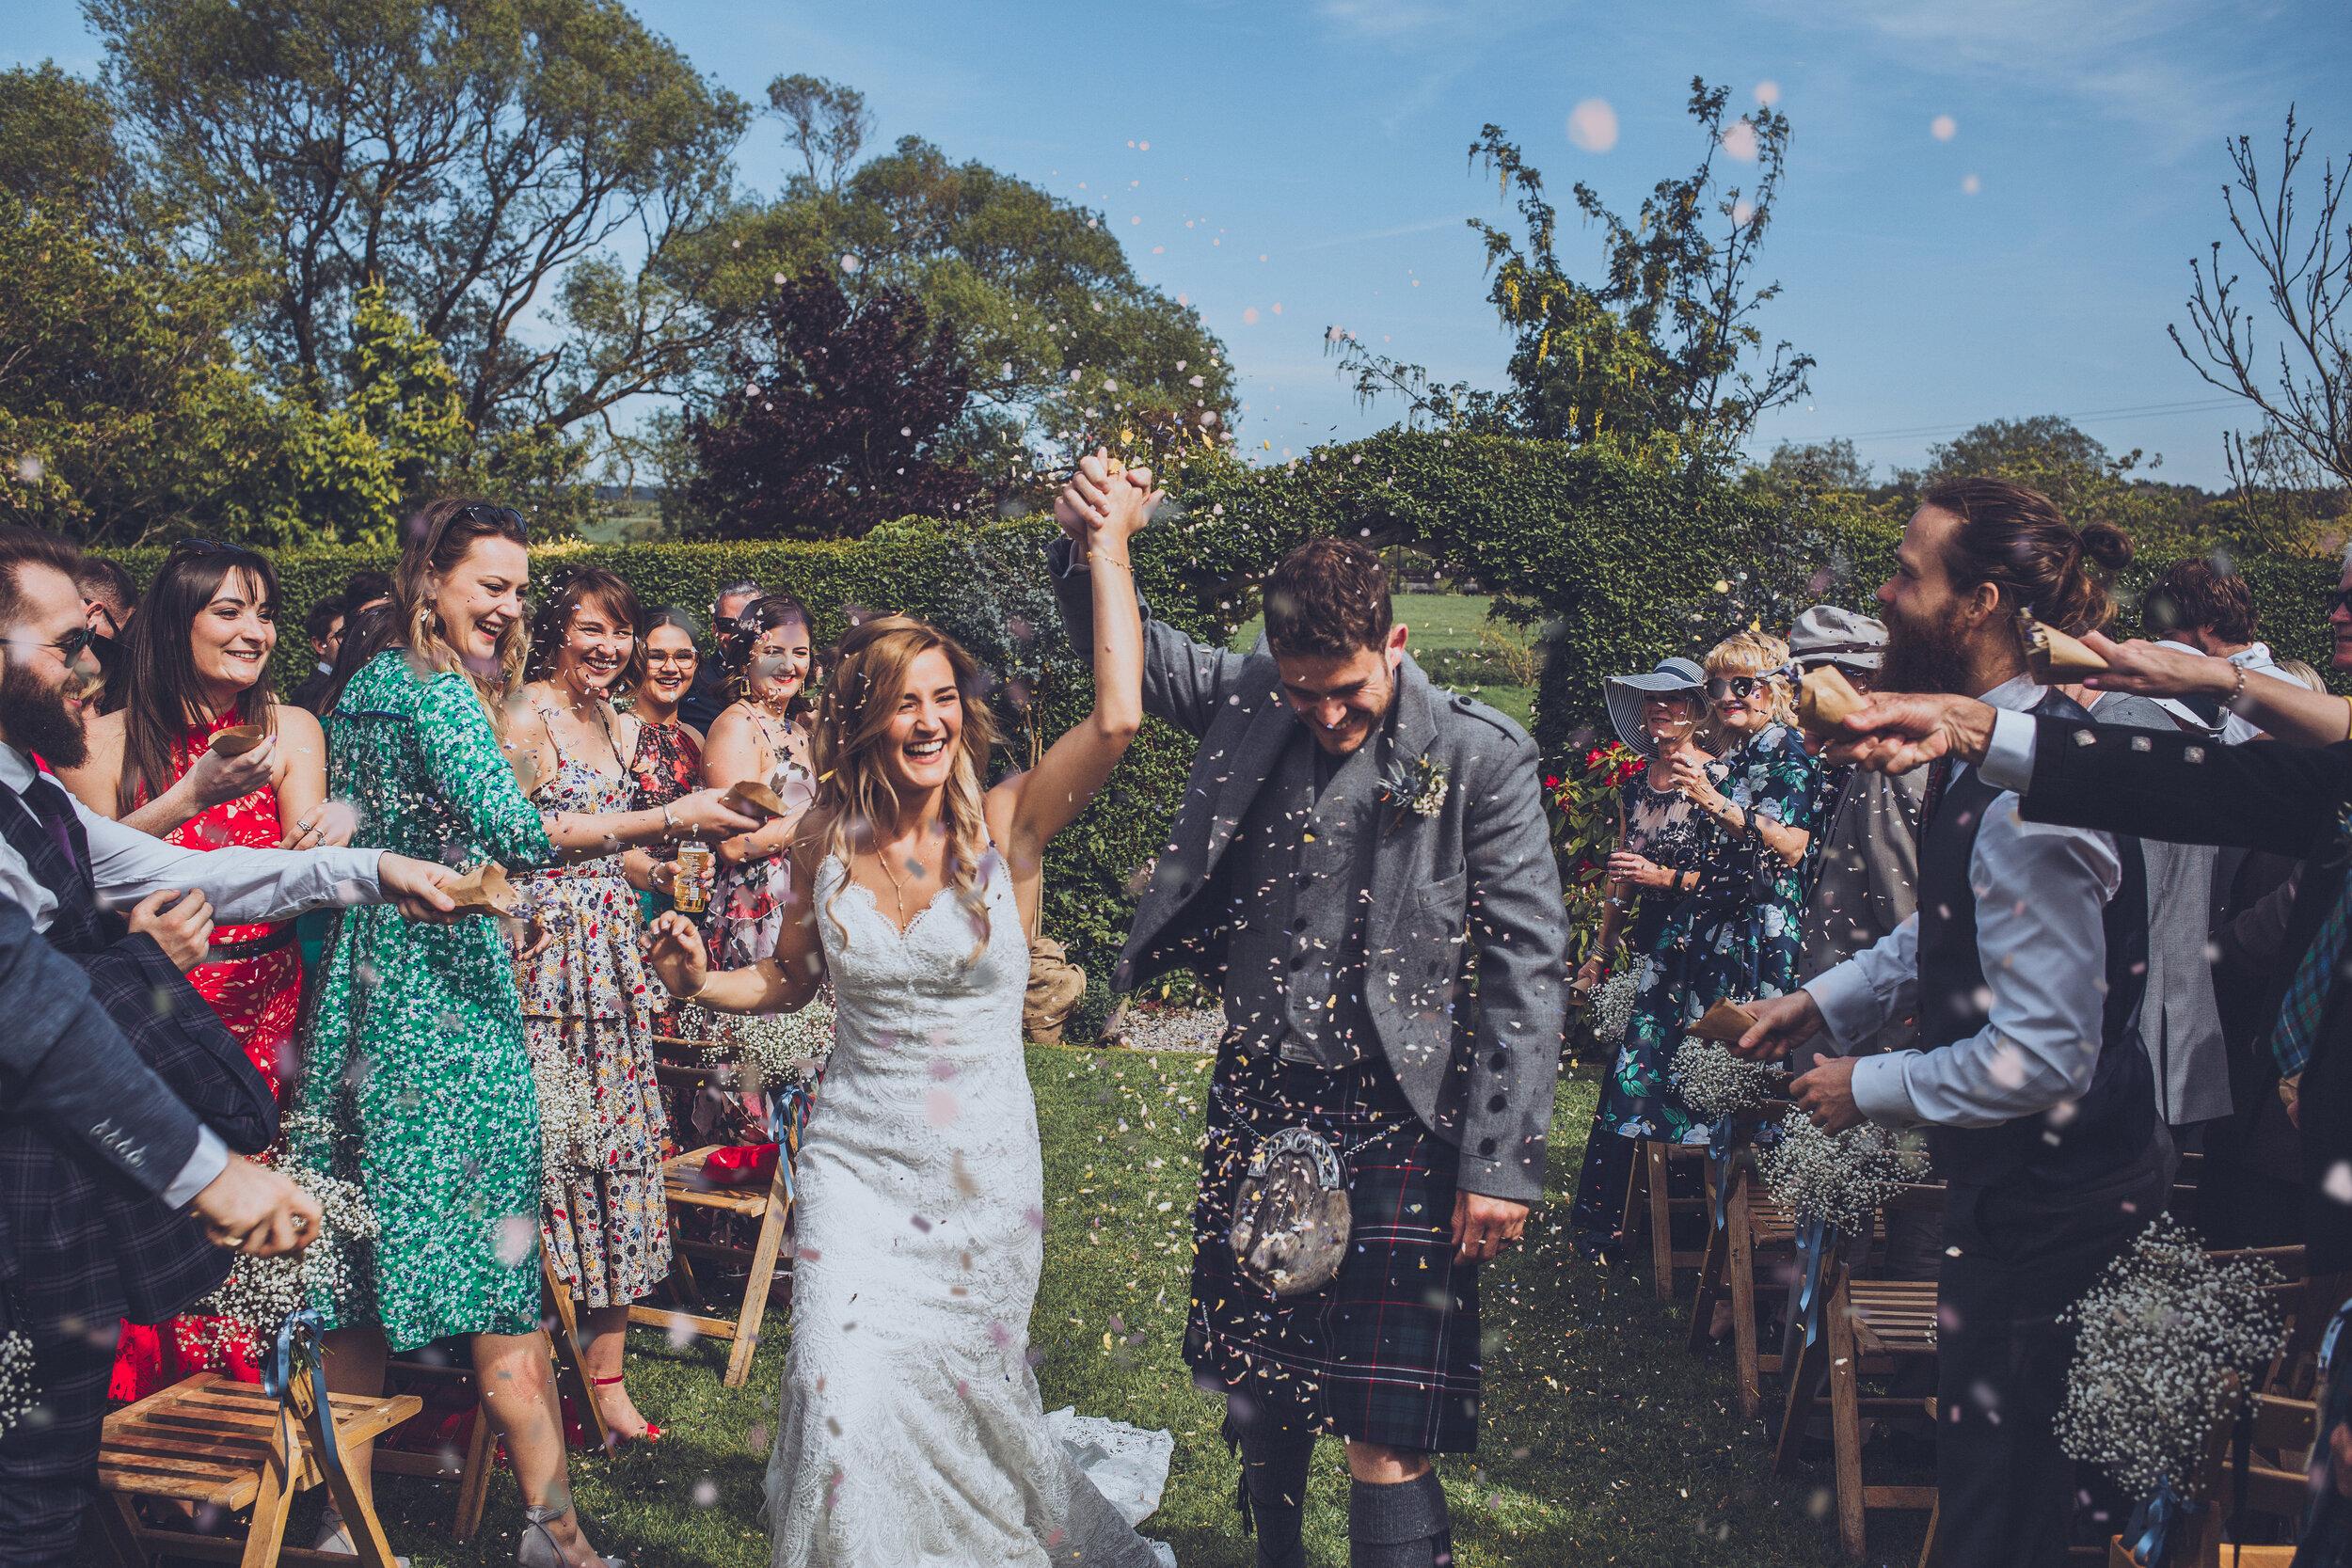 Dalduff Farm Ayrshire Wedding Photography - Claire Basiuk Photographer - 12.jpg